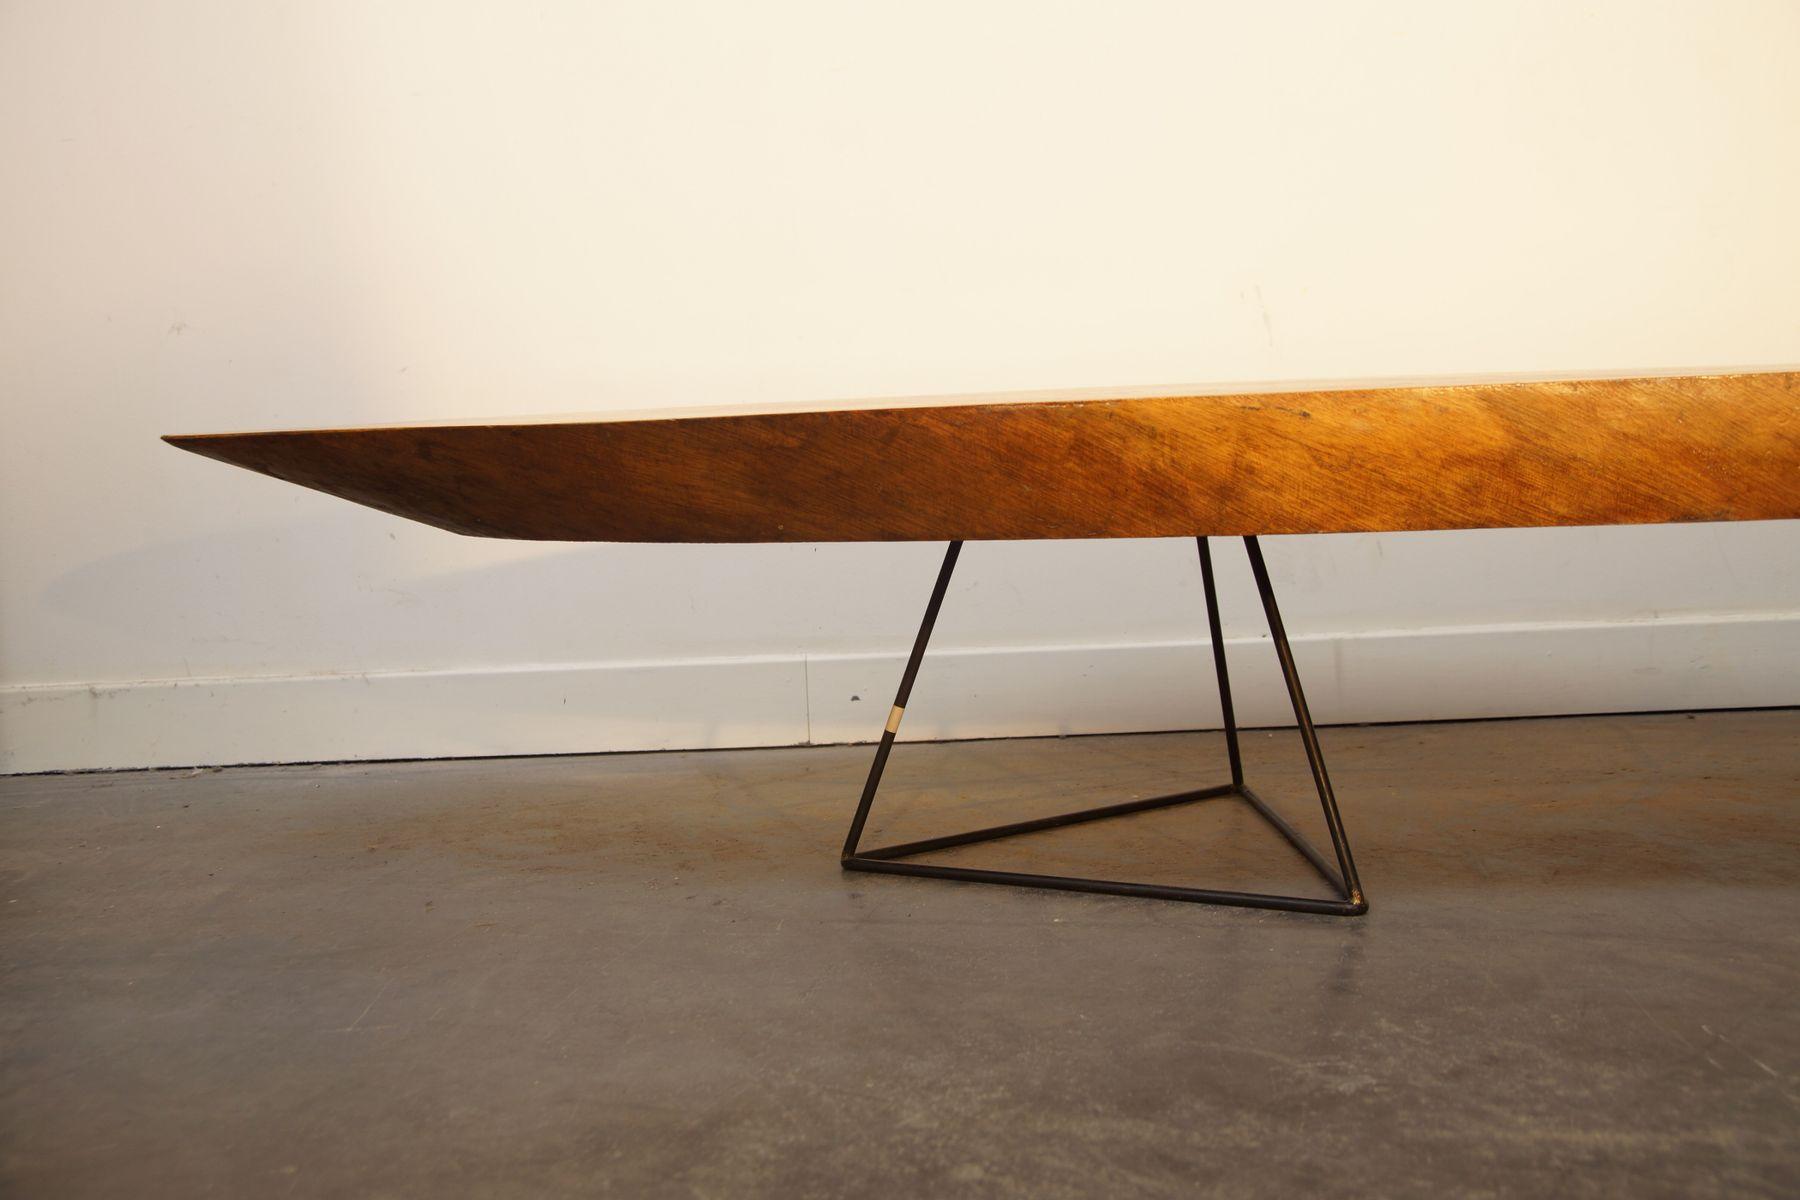 grande table basse tronc d 39 arbre vintage en vente sur pamono. Black Bedroom Furniture Sets. Home Design Ideas